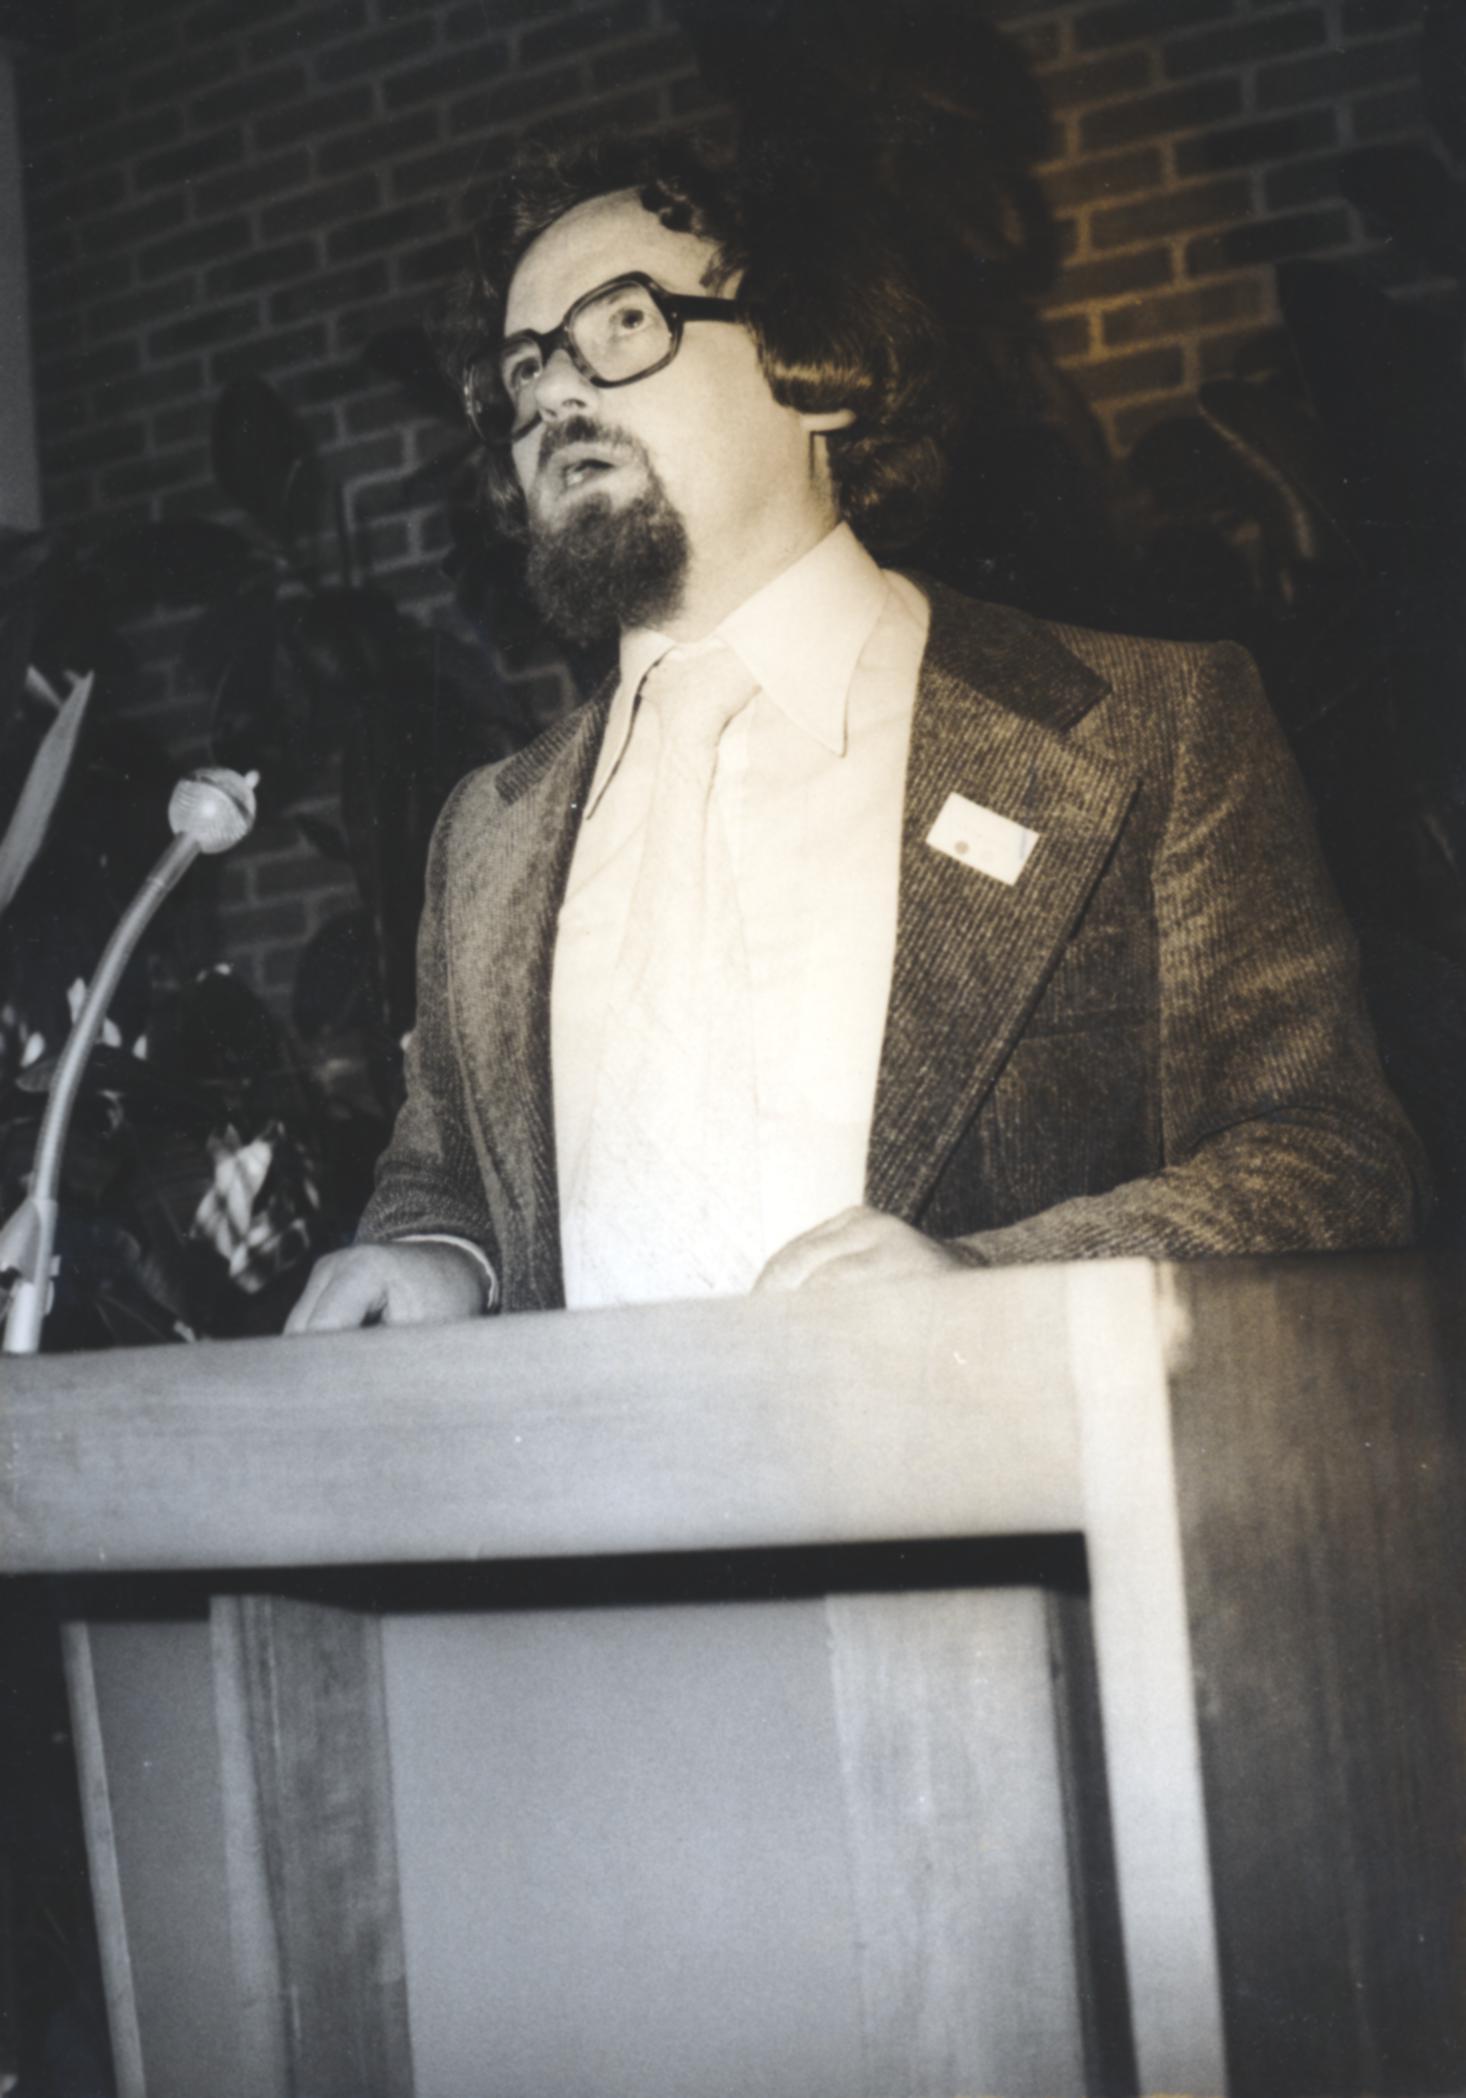 V. Internat. Imago Mundi-Kongress 1974, Cusanus Akademie, Brixen, Dr. Bernhard Spörlein